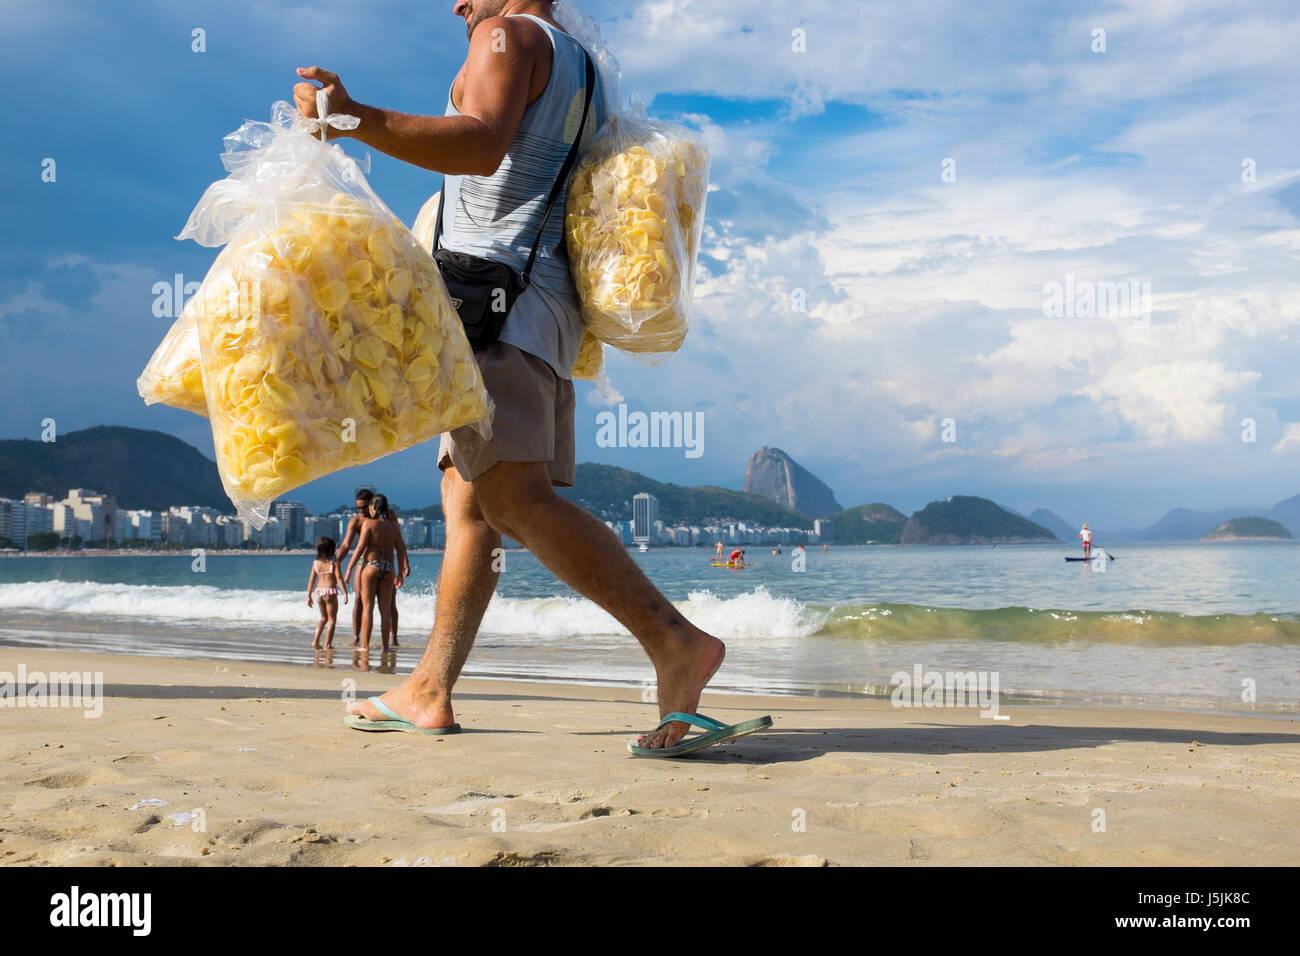 RIO DE JANEIRO - 2. März 2017: A brasilianischen Hersteller Copacabana Strand Spaziergänge Tragetaschen Stockbild